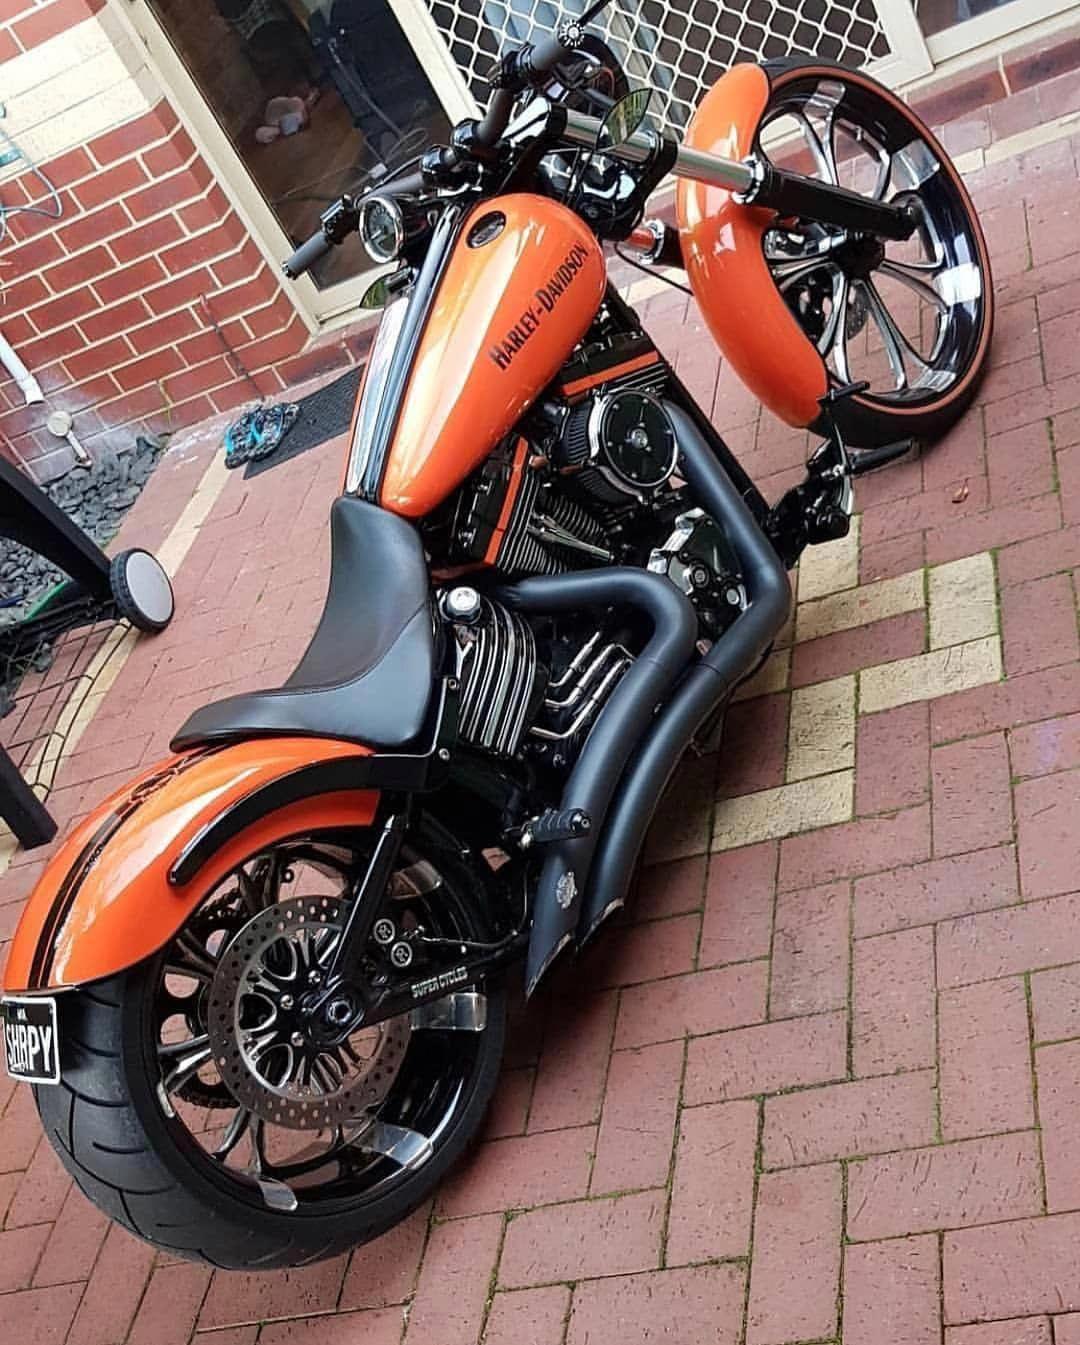 harley davidson softail for sale #Harleydavidsonsoftail